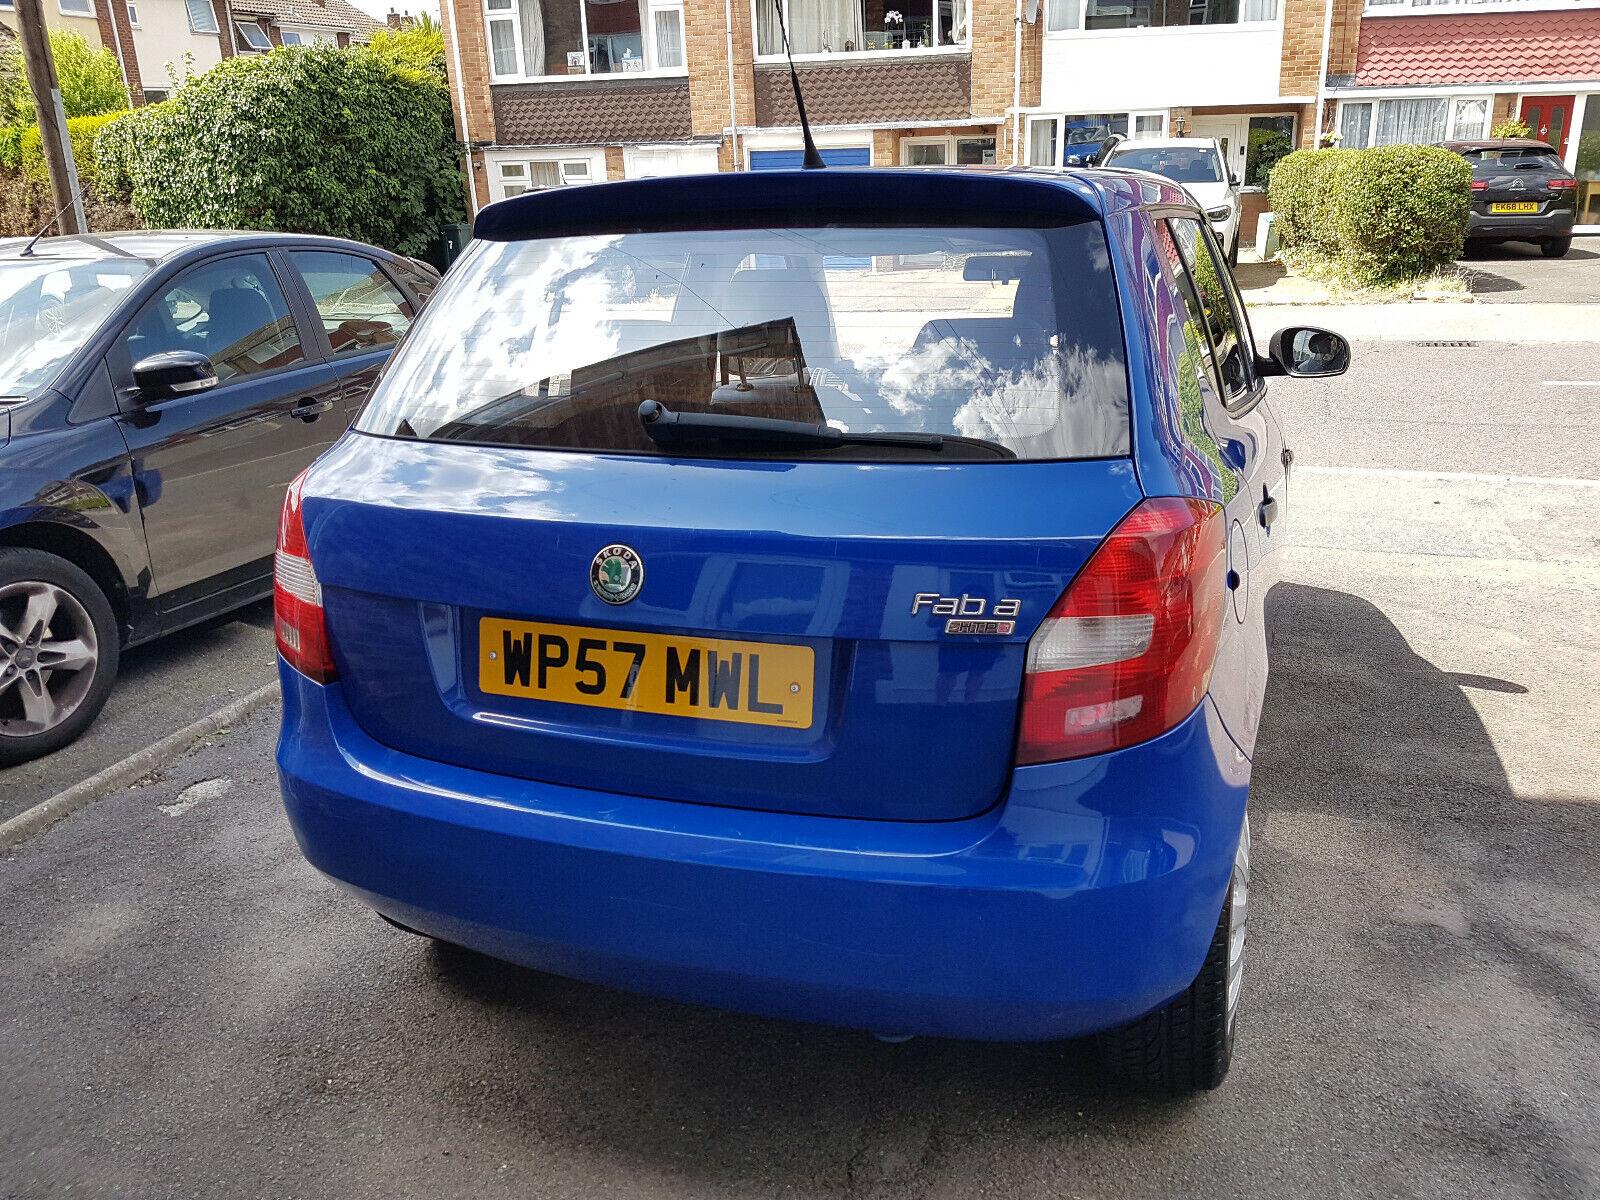 2007-Skoda-Fabia-12-Petrol-Manual-5-Door-Hatchback